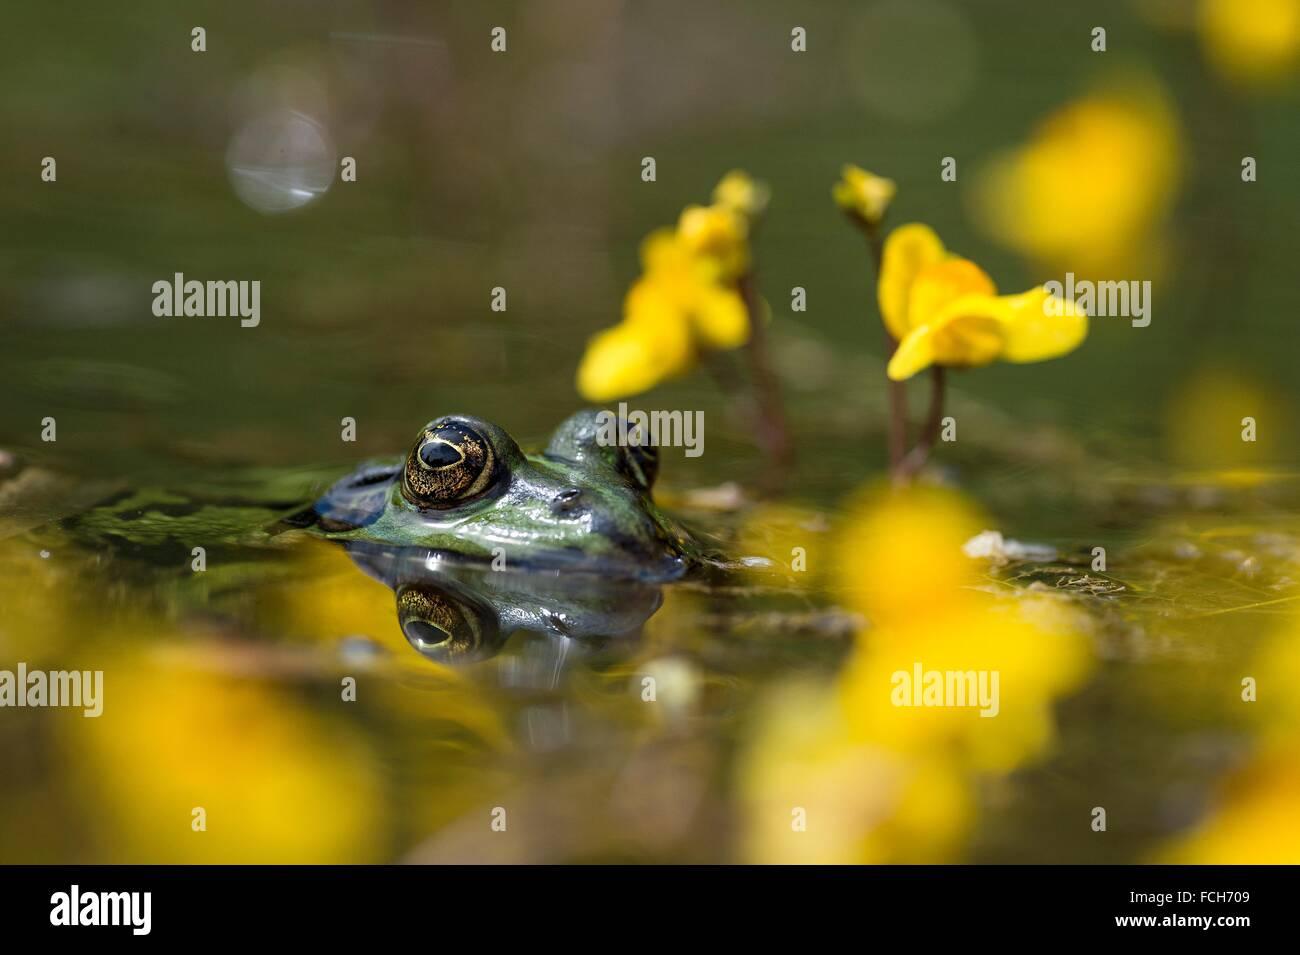 Edible frob (Rana esculenta), between blossoms of water hose (Utricularia vulgaris), Bavaria, Germany. - Stock Image